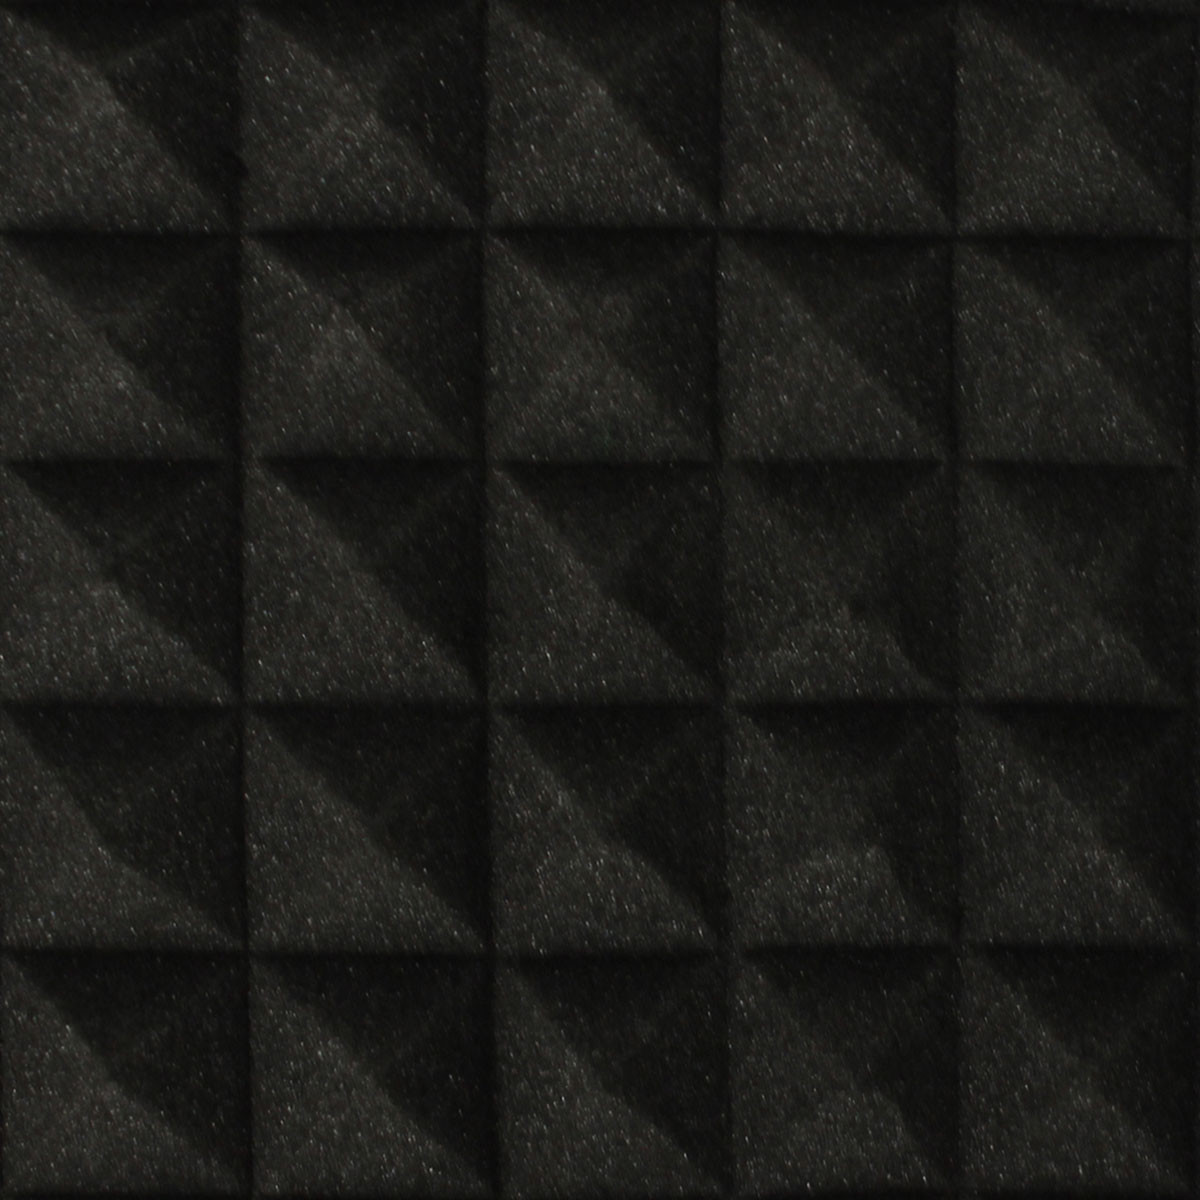 pyramiden akustik d mmung noppenschaum schallschutz. Black Bedroom Furniture Sets. Home Design Ideas